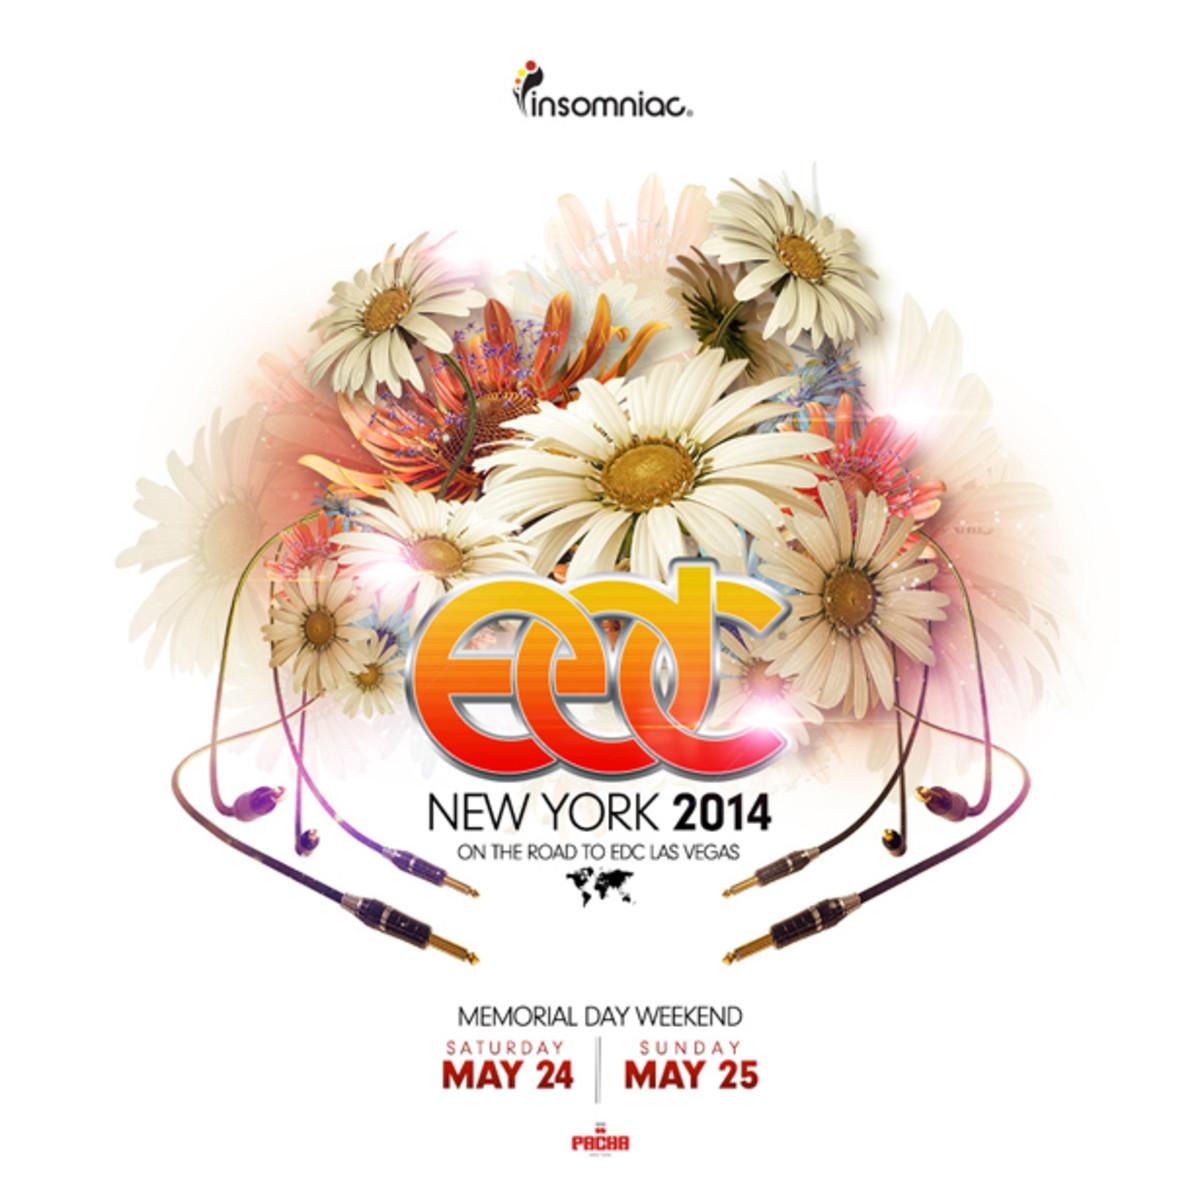 Tis The Season... Of Festival Announcements! Insomniac Releases EDC New York Info - EDM News